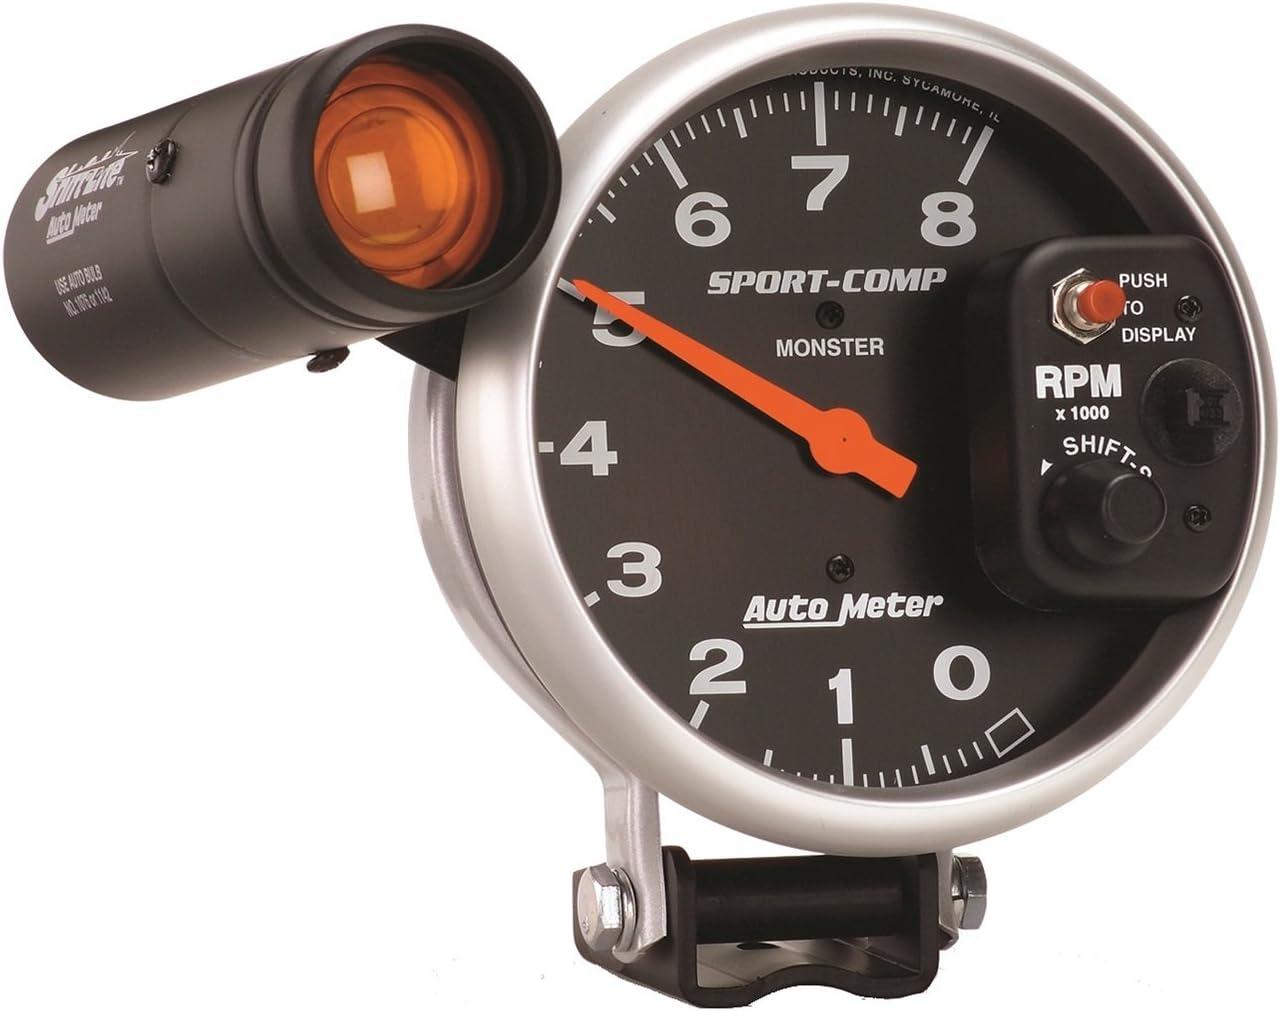 Auto Meter 3905 Sport-Comp Shift-Lite Tachometer